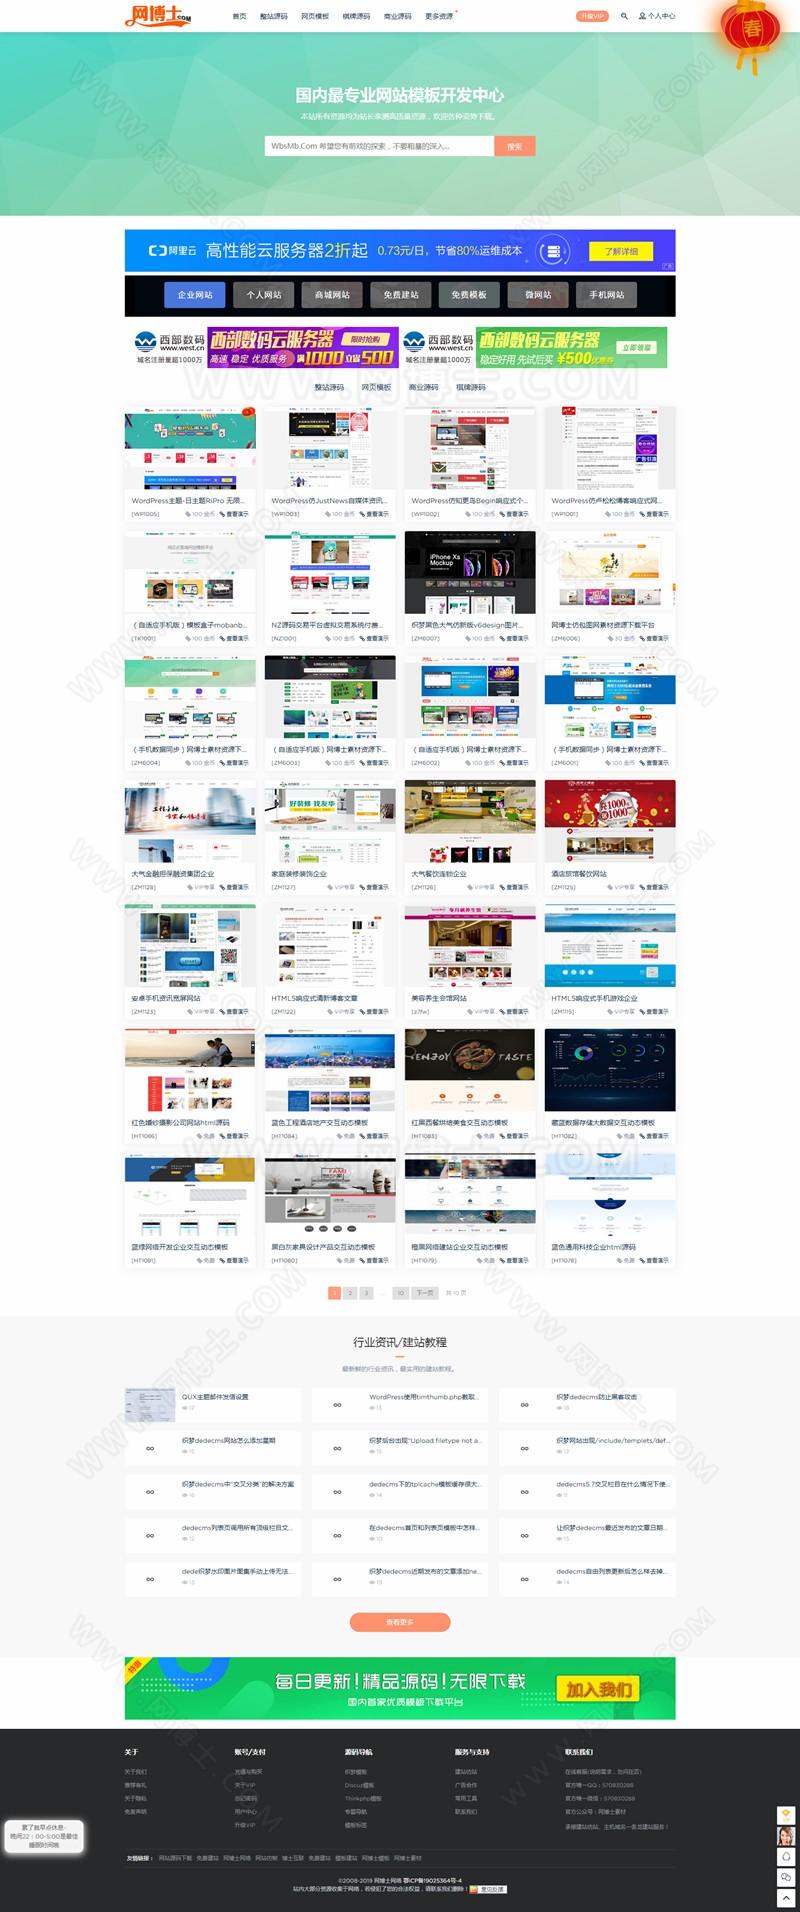 WordPress主题-模板兔 无限制版 适用于虚拟资源分享下载平台